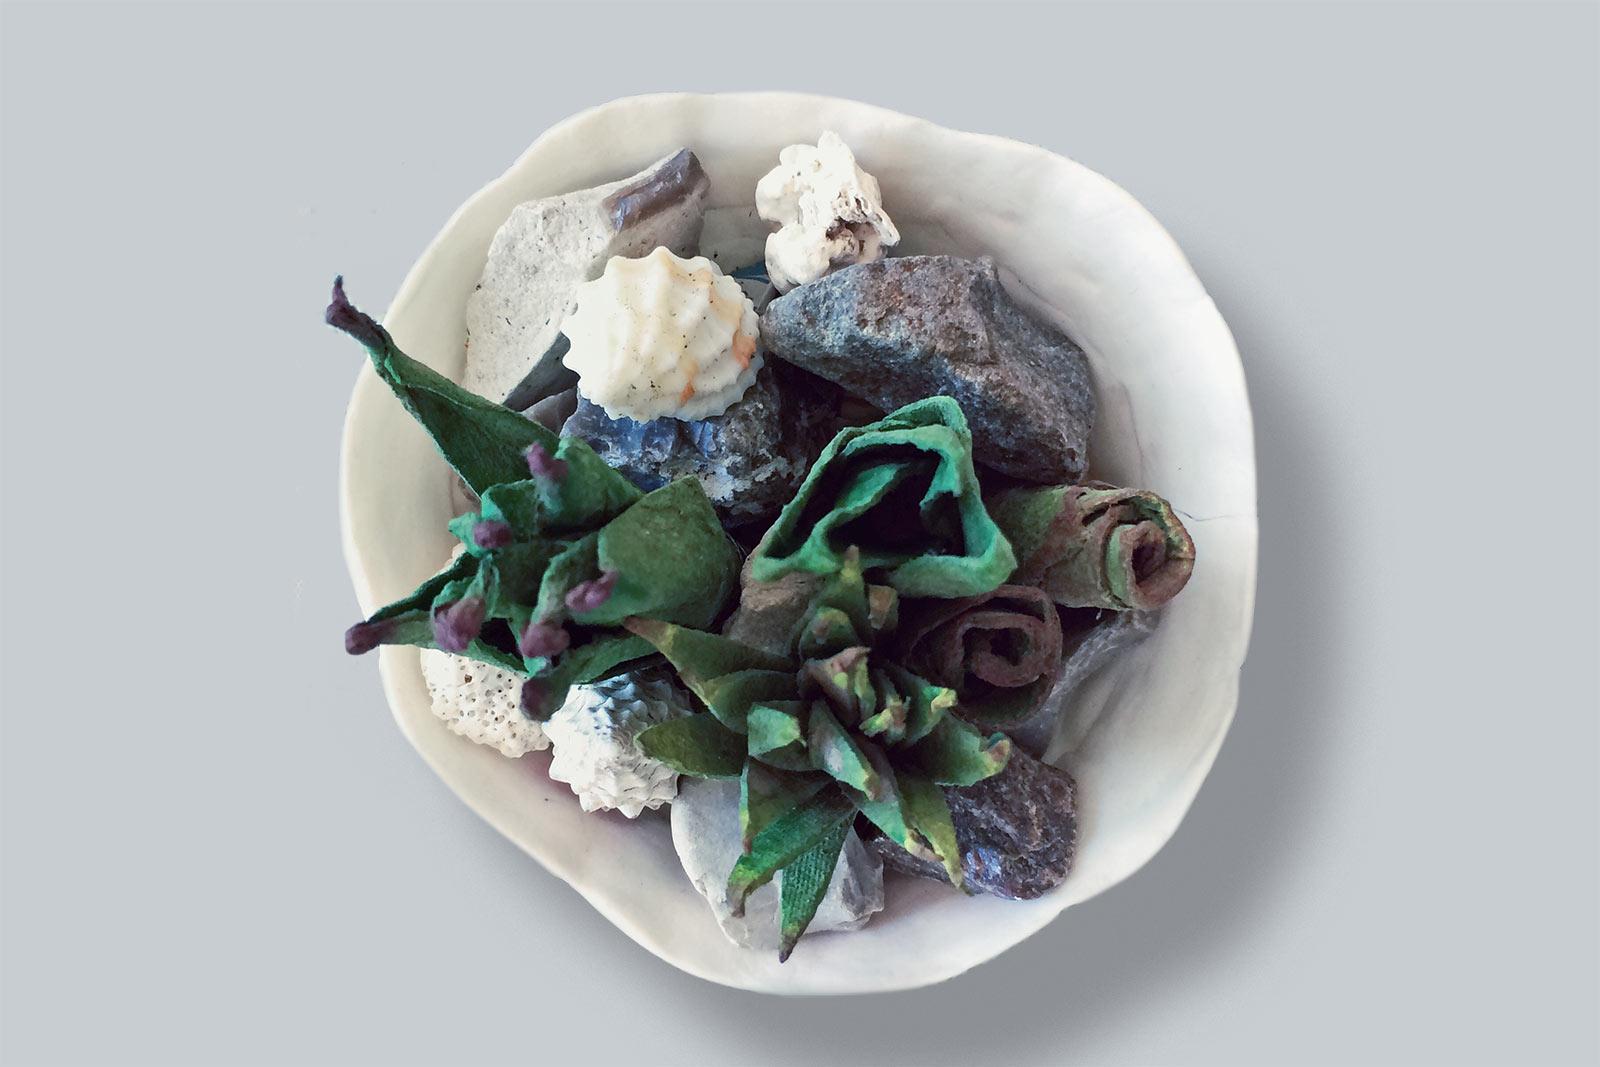 Papierpflanze von Ekaterina Ezhkova